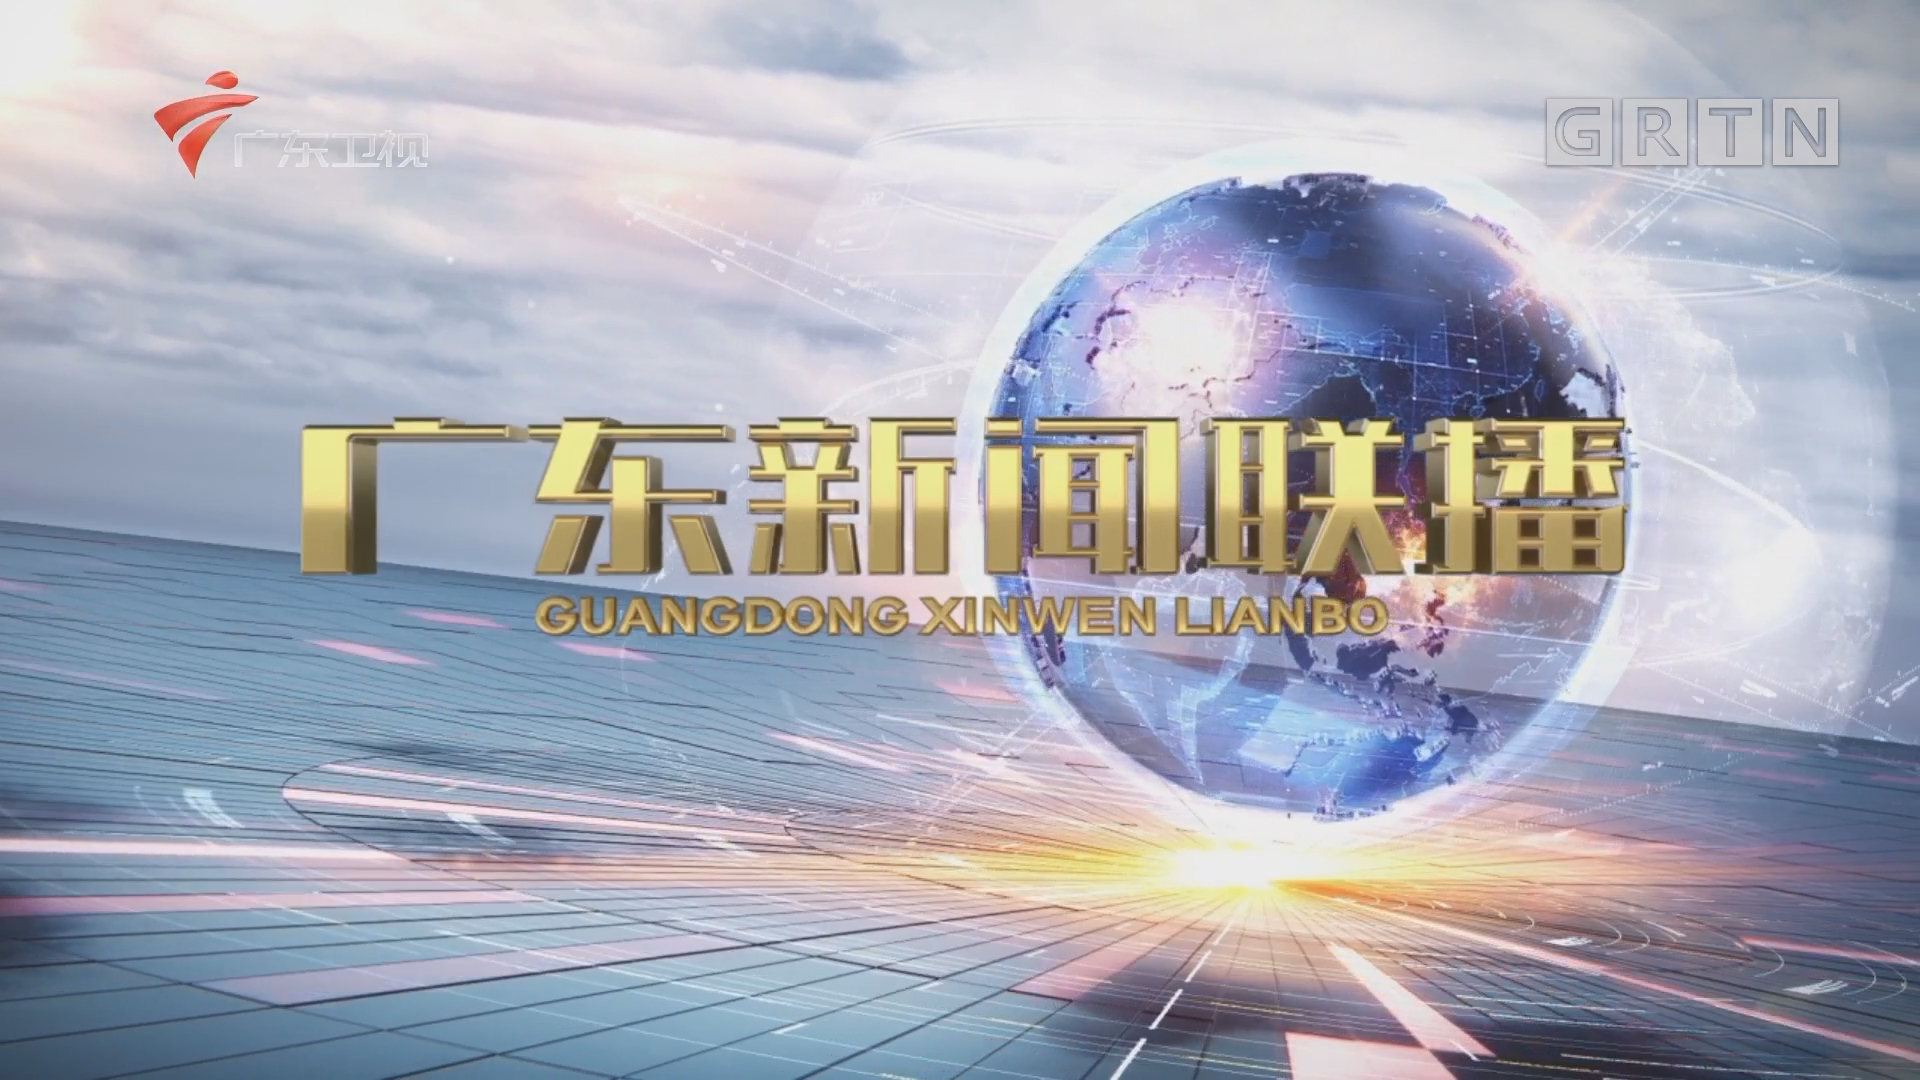 [HD][2019-10-02]manbetx手机版 - 登陆新闻联播:庆祝中华人民共和国成立70周年 天安门广场举行盛大联欢活动